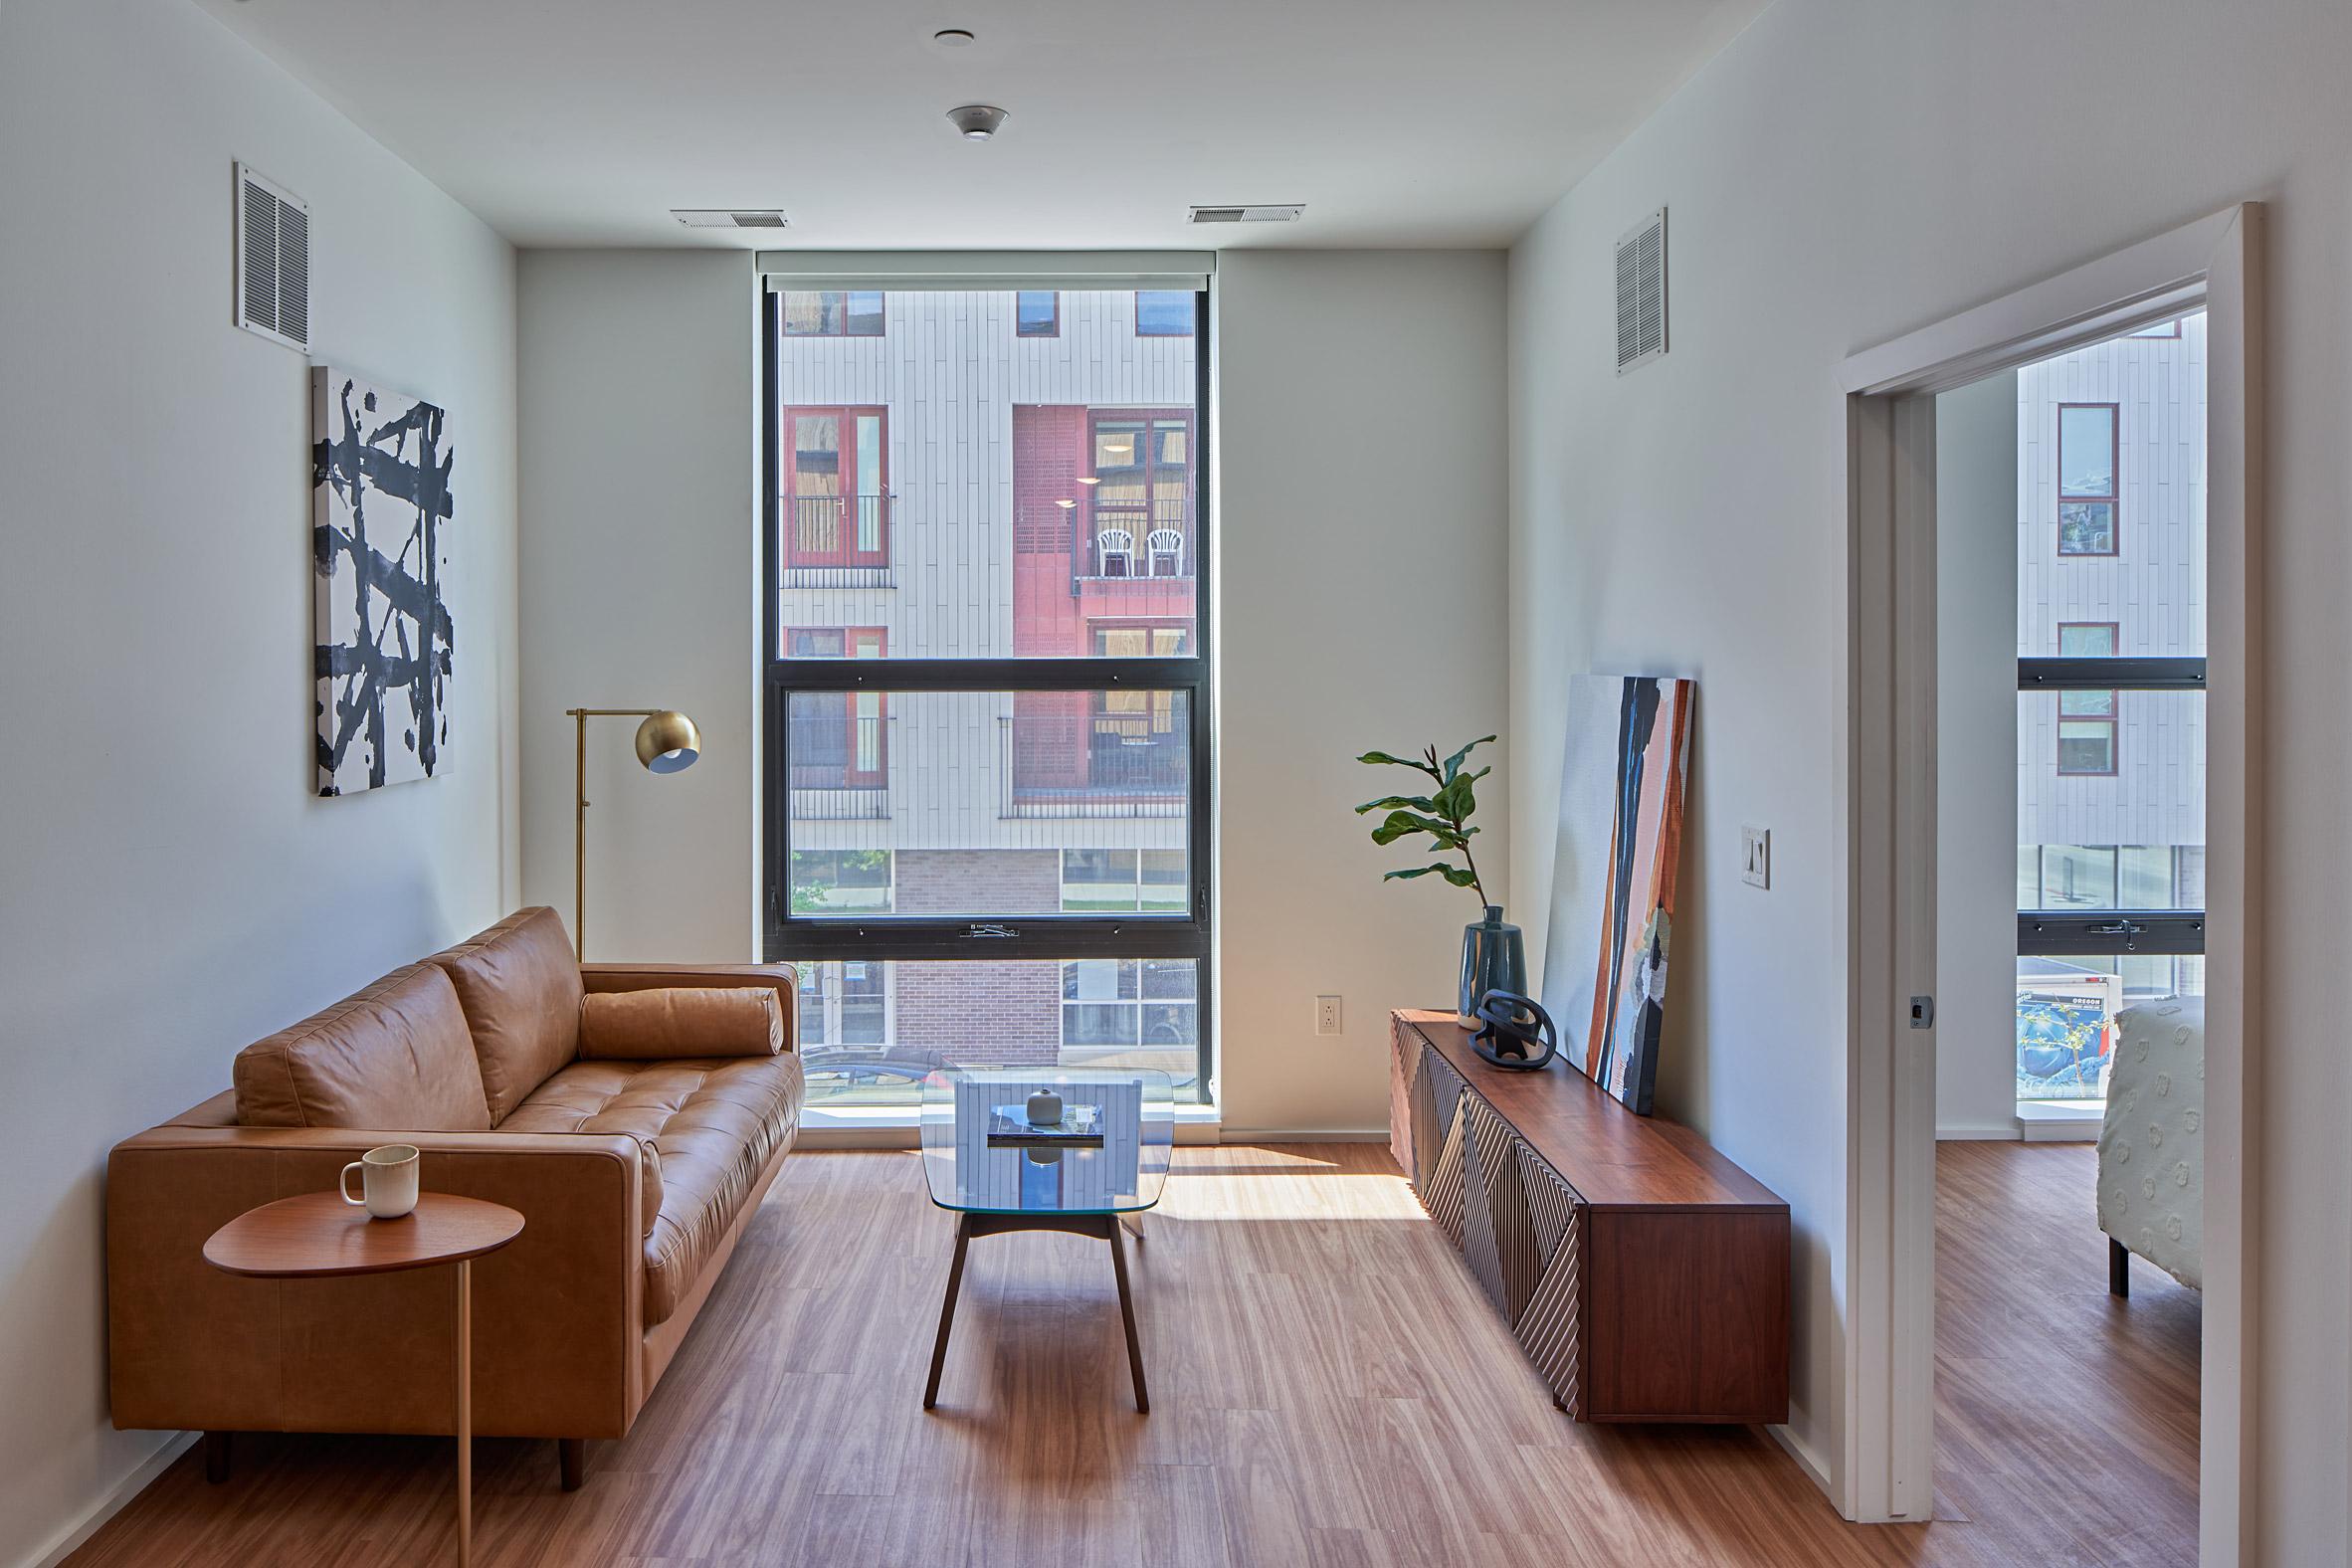 John R 2660 has floor-to-ceiling windows in its rooms